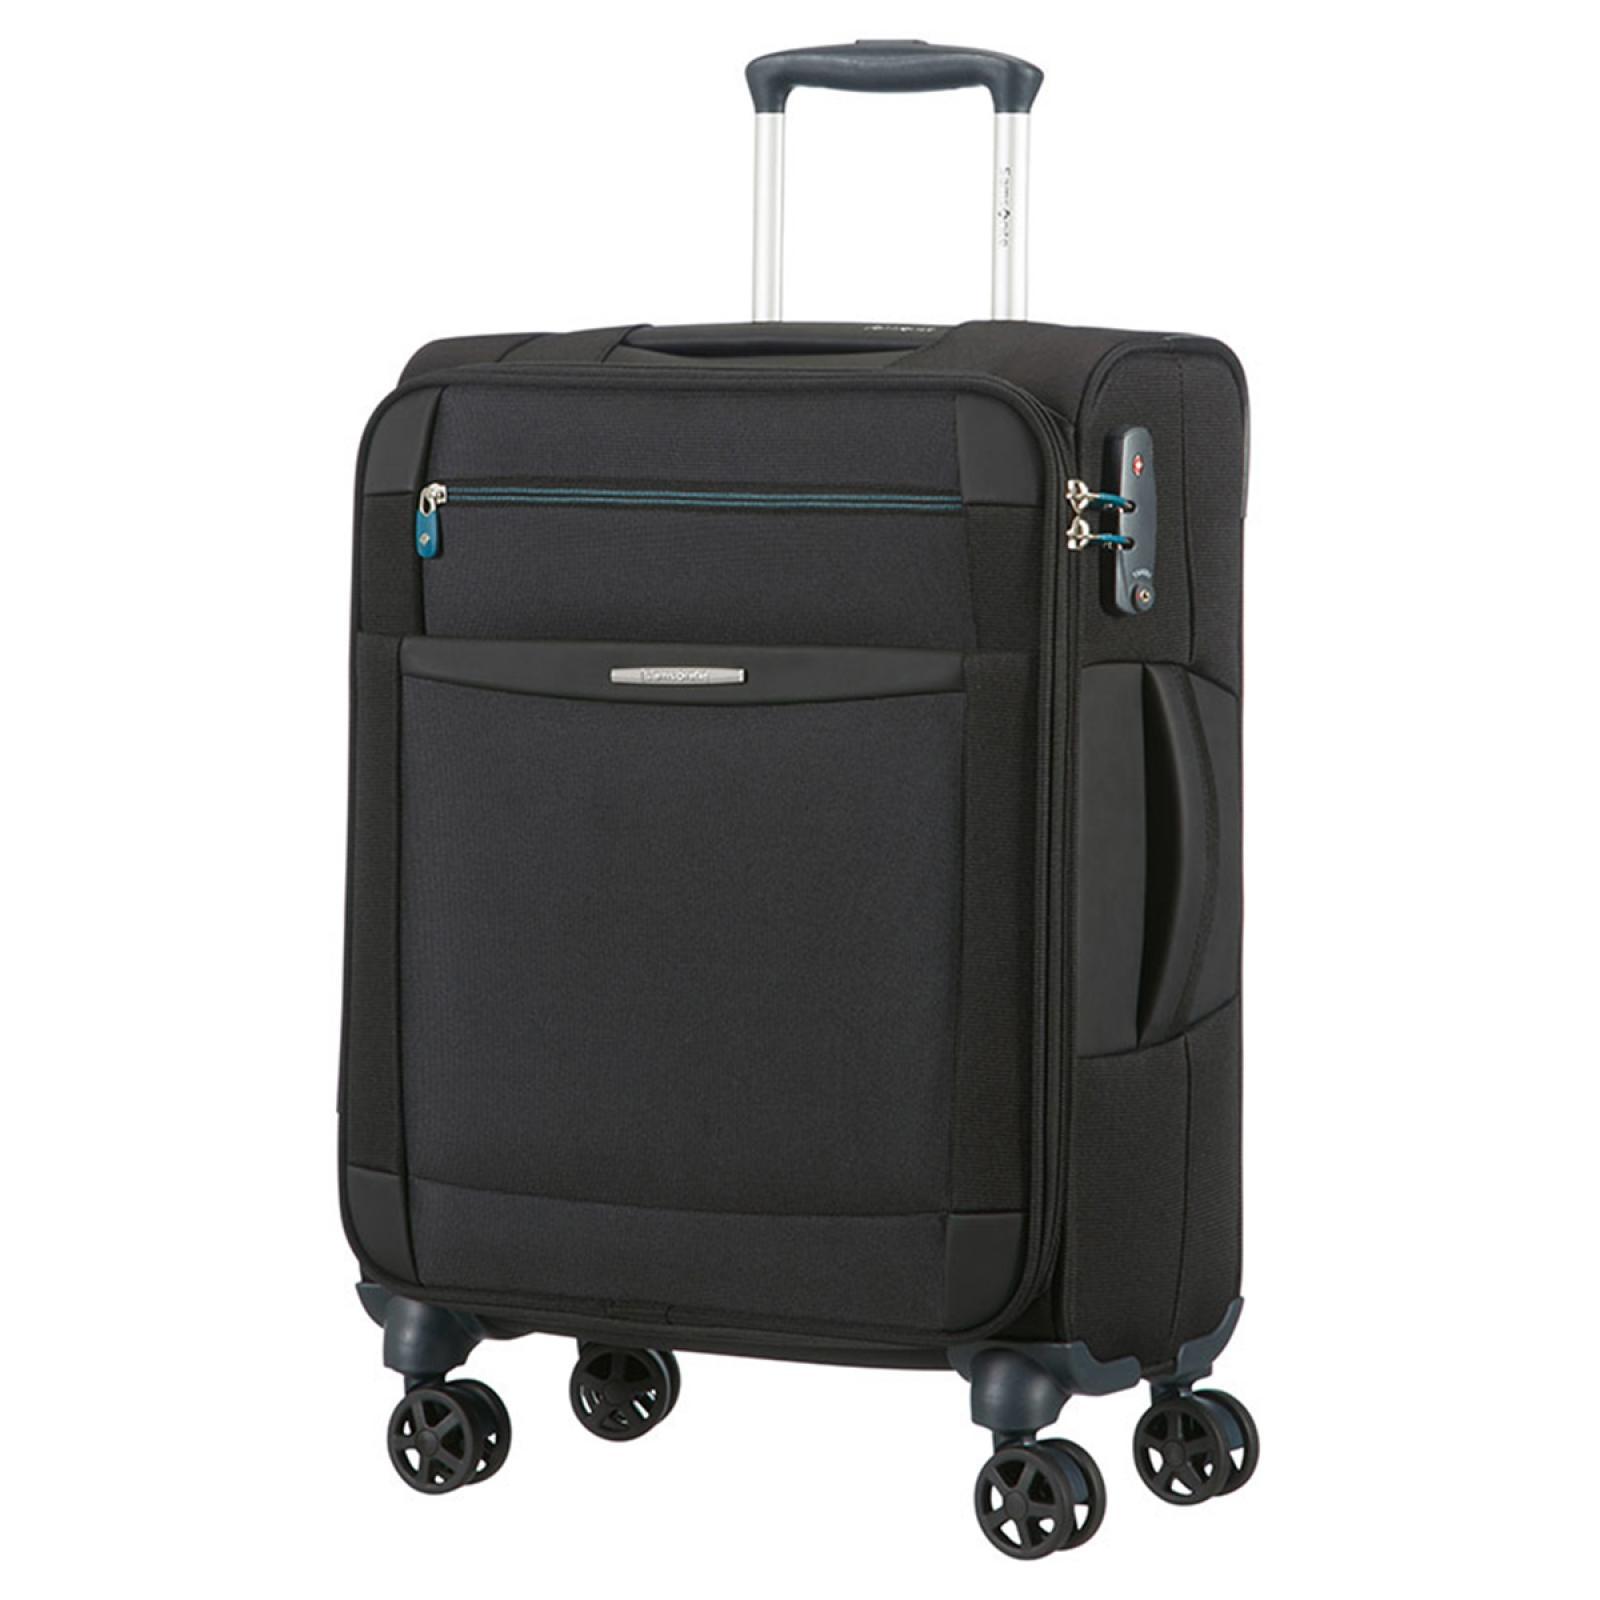 Samsonite Cabin Luggage Spinner 55/20 Dynamo - 1